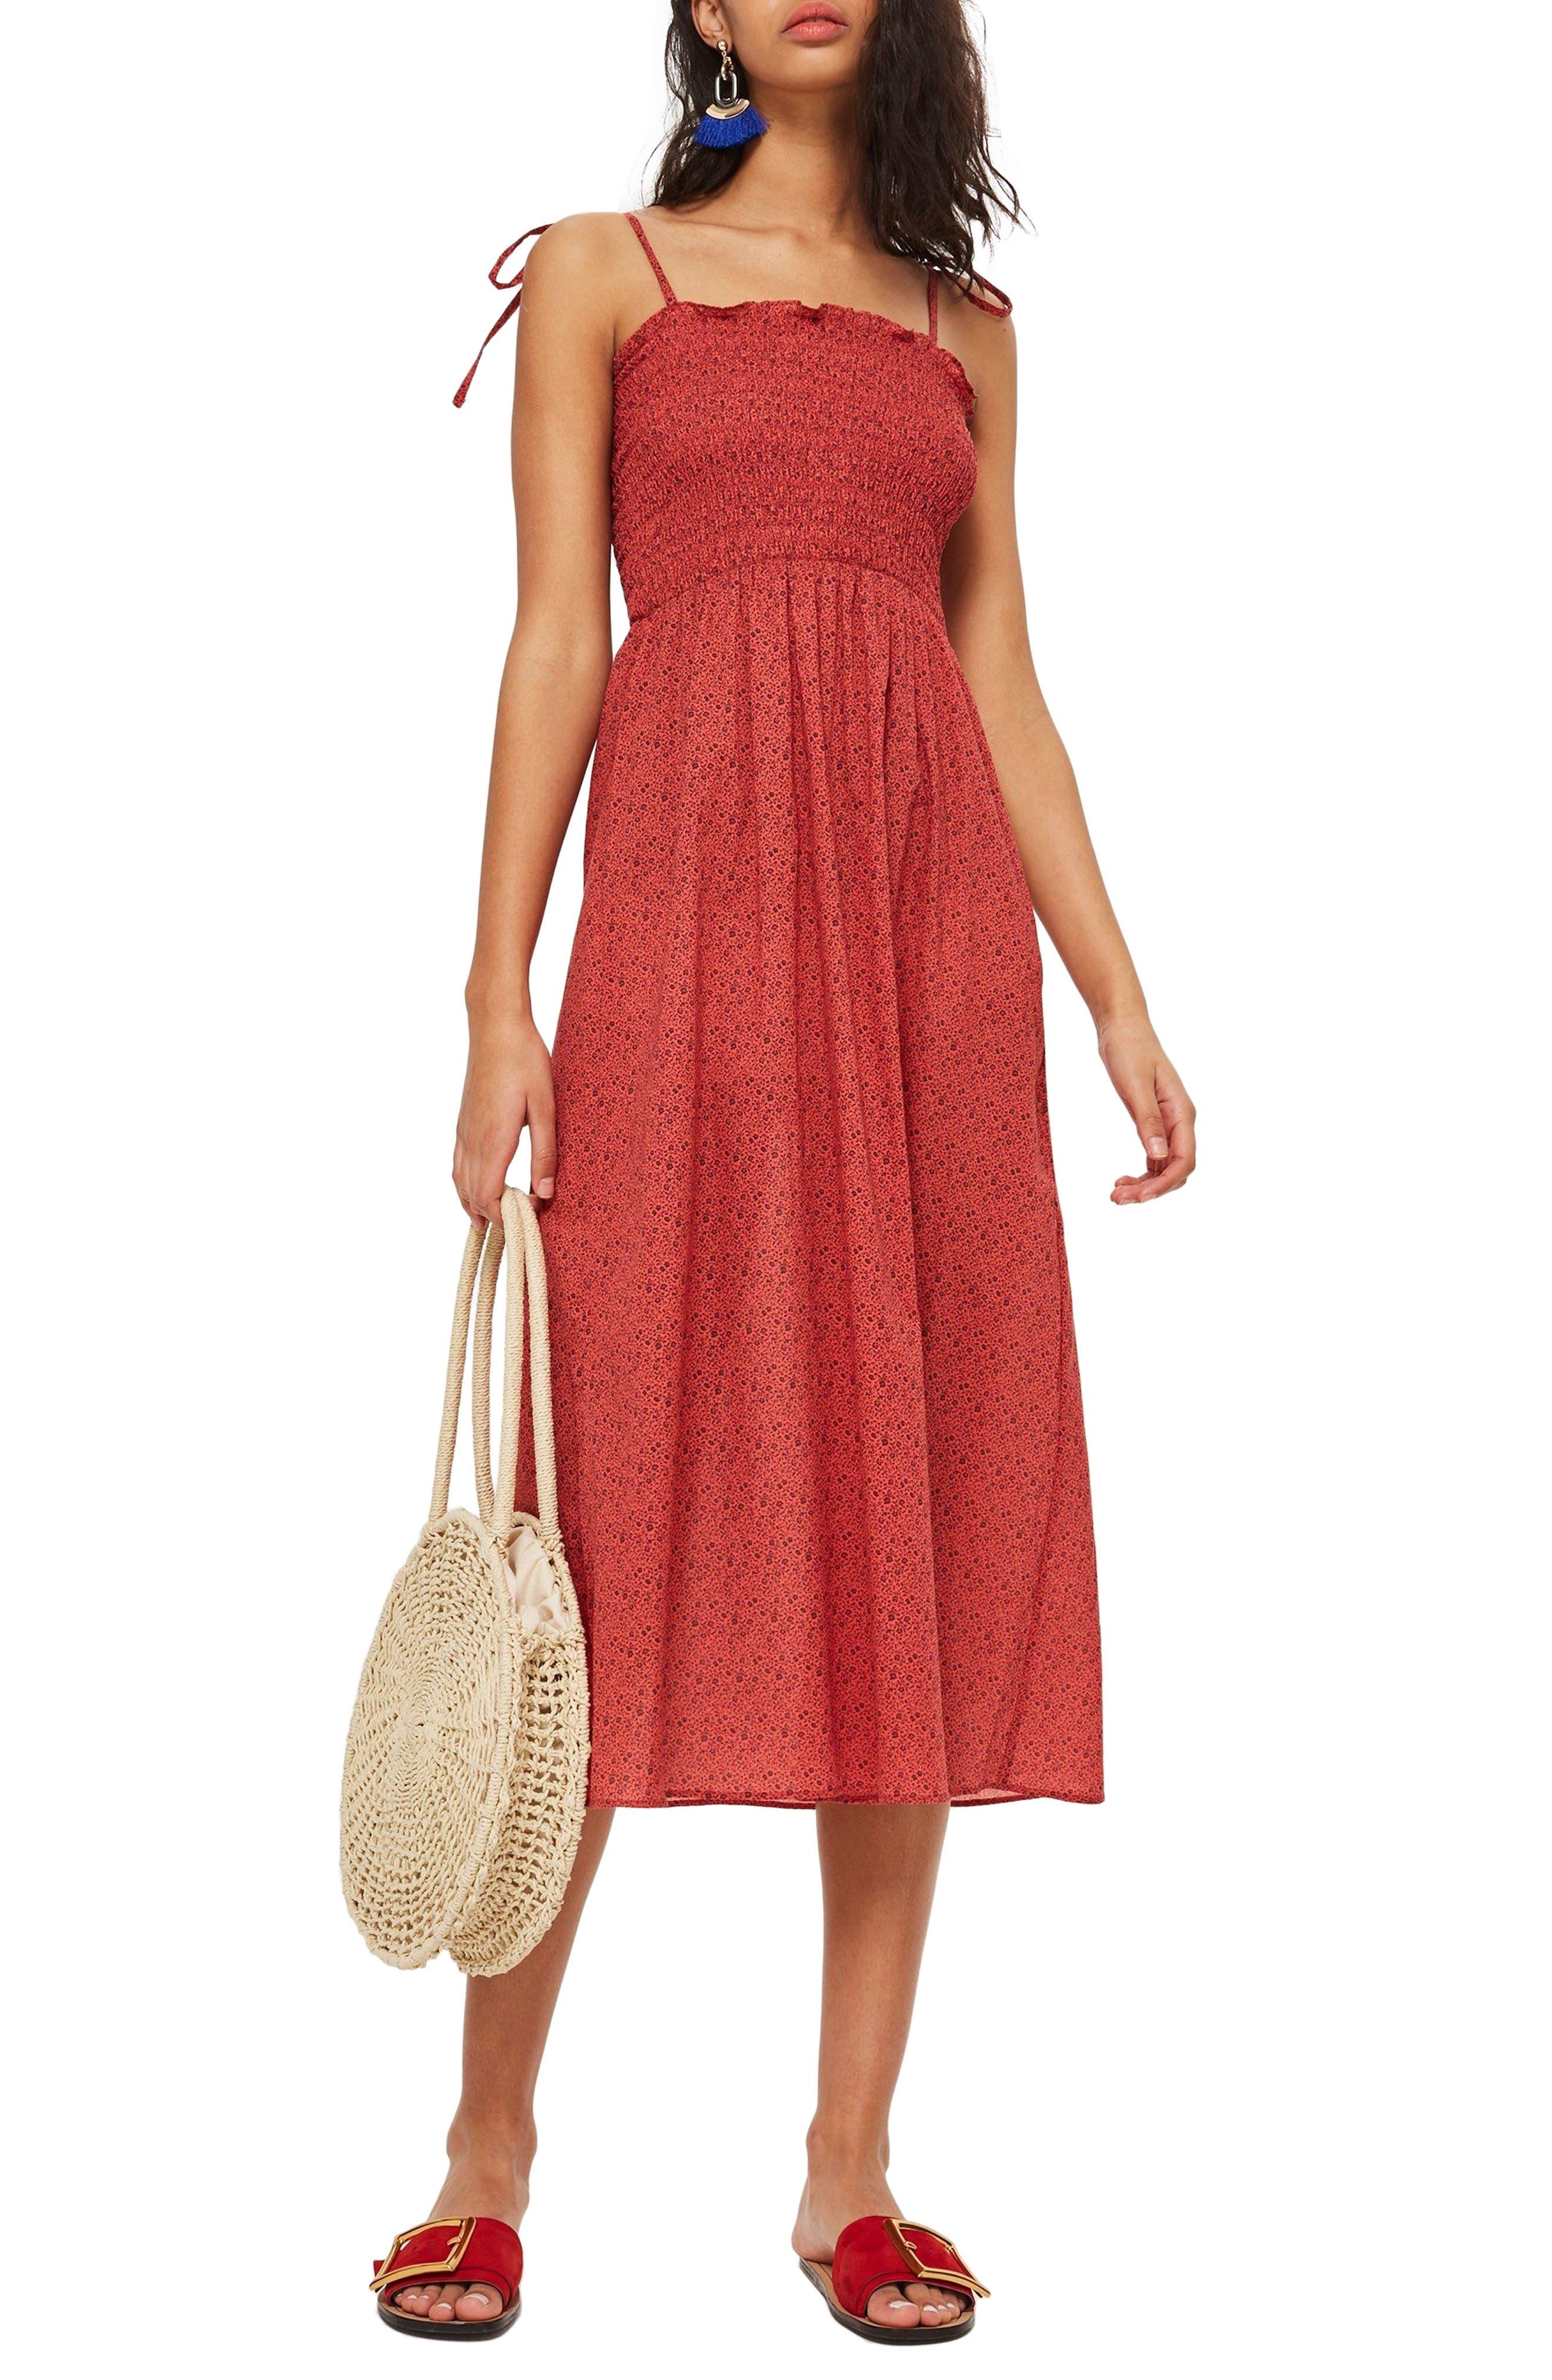 Topshop Ditsy Shirred Midi Dress